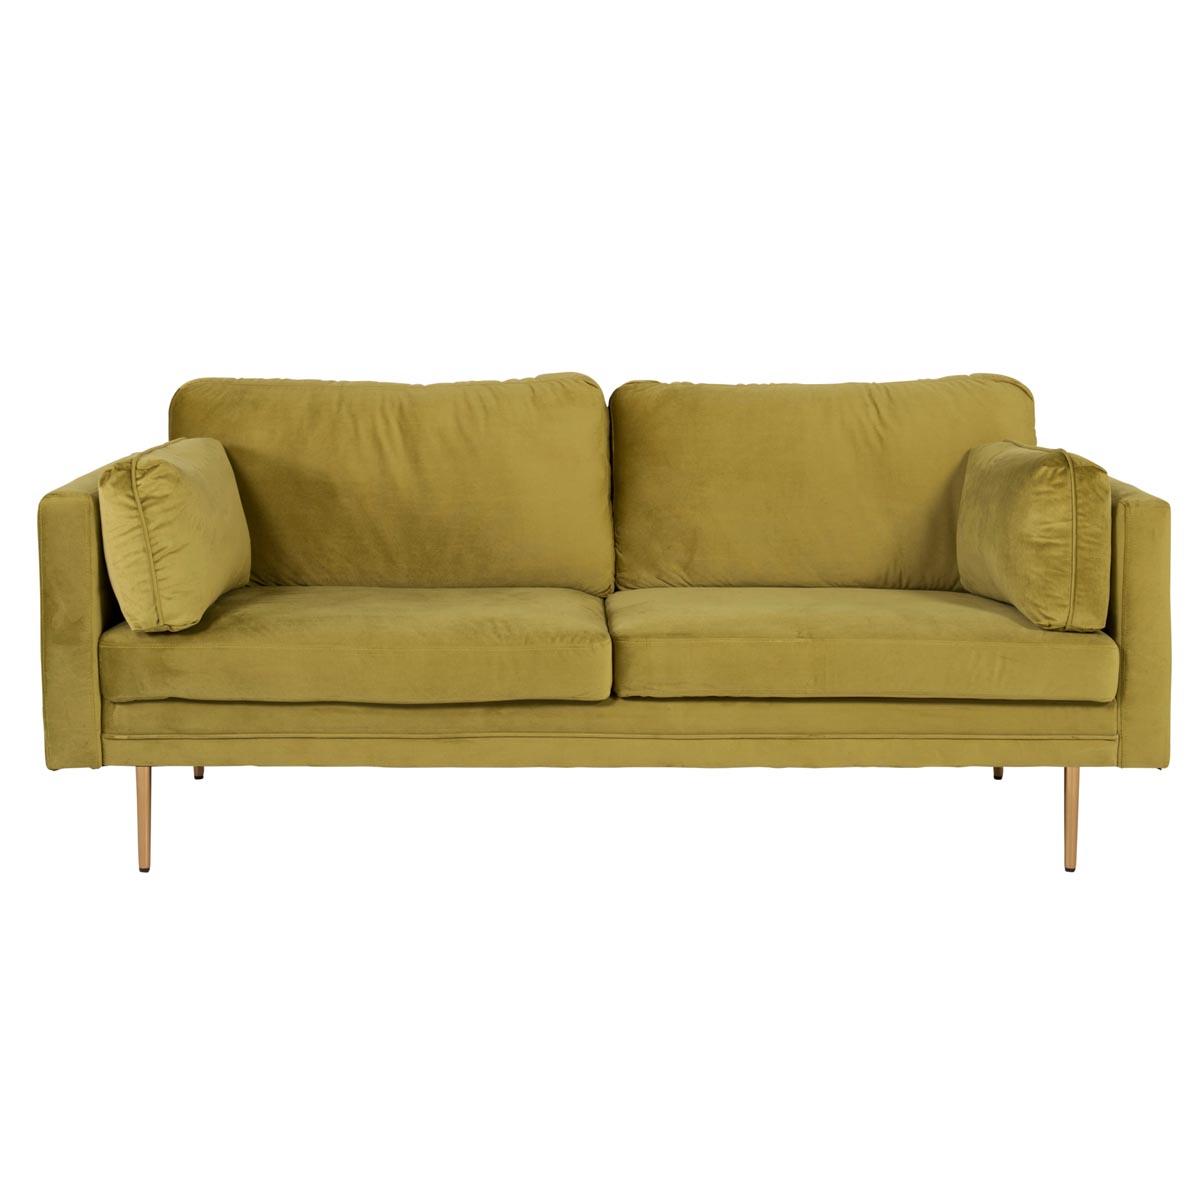 Boom-3-sits-soffa-gron-sammet-18045-894